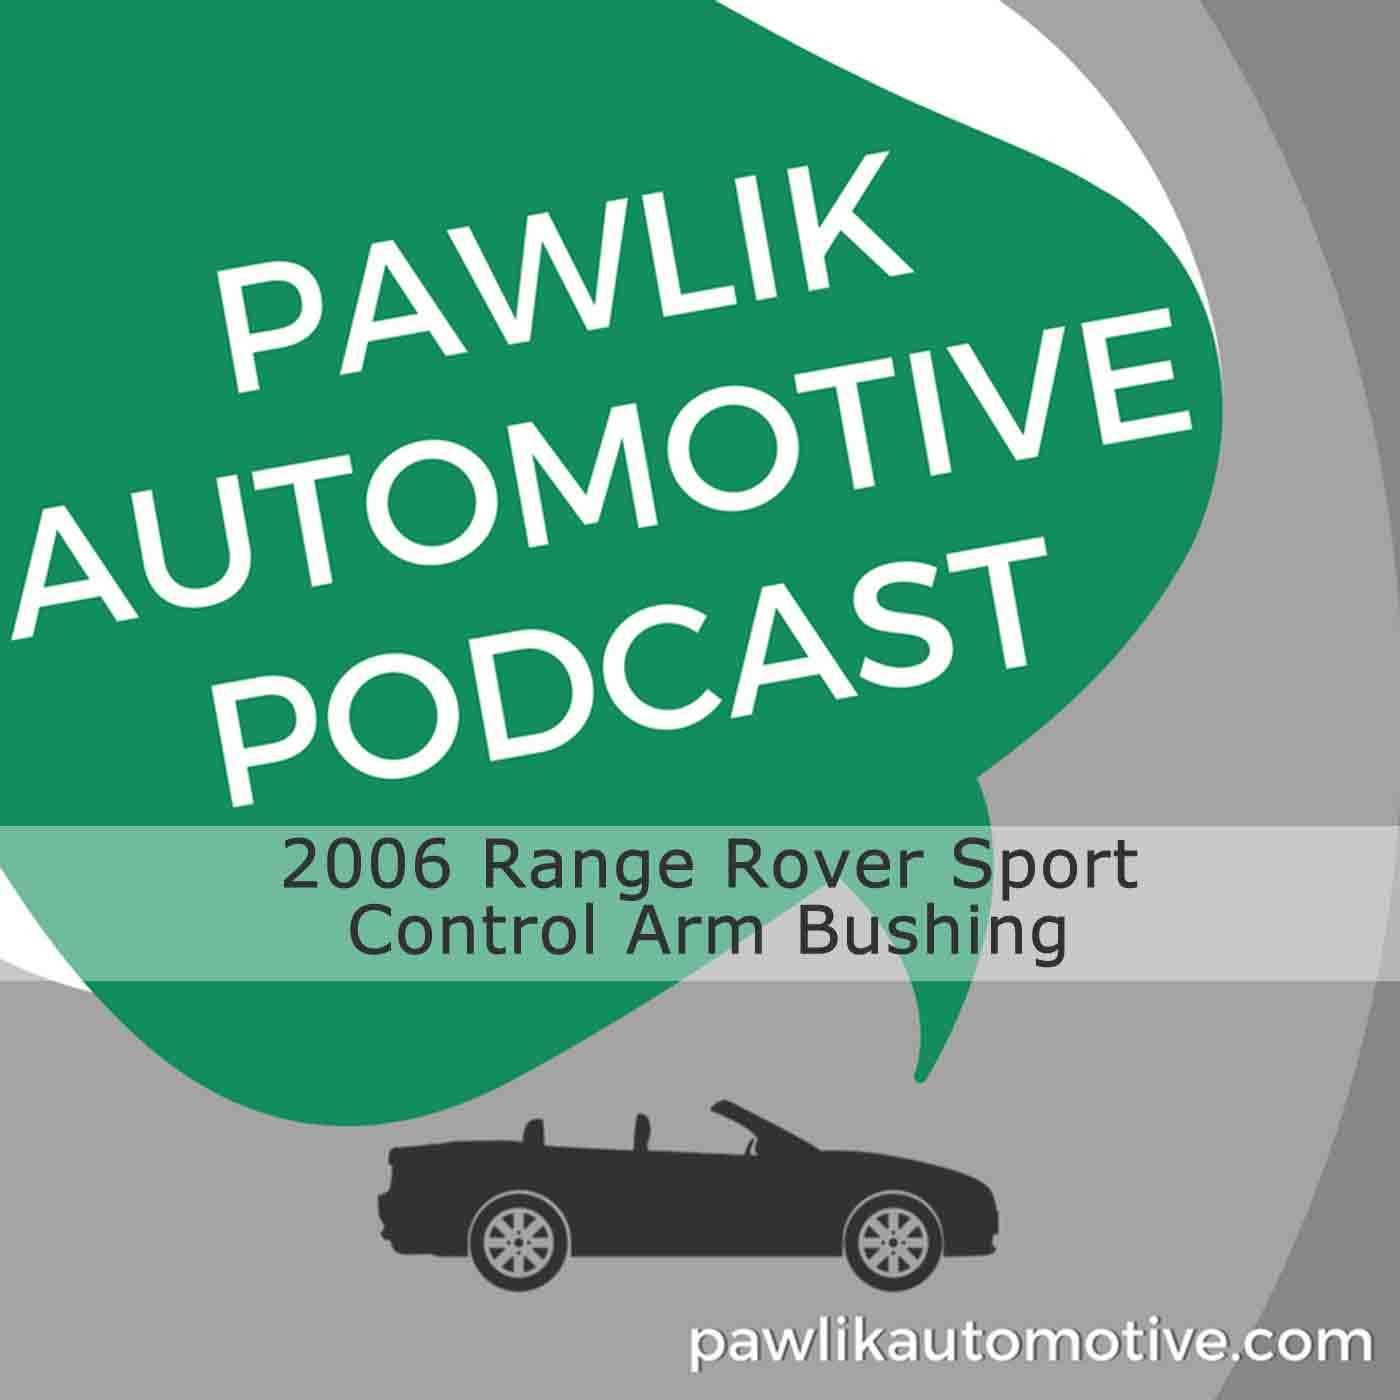 Artwork for 2006 Range Rover Sport Control Arm Bushing